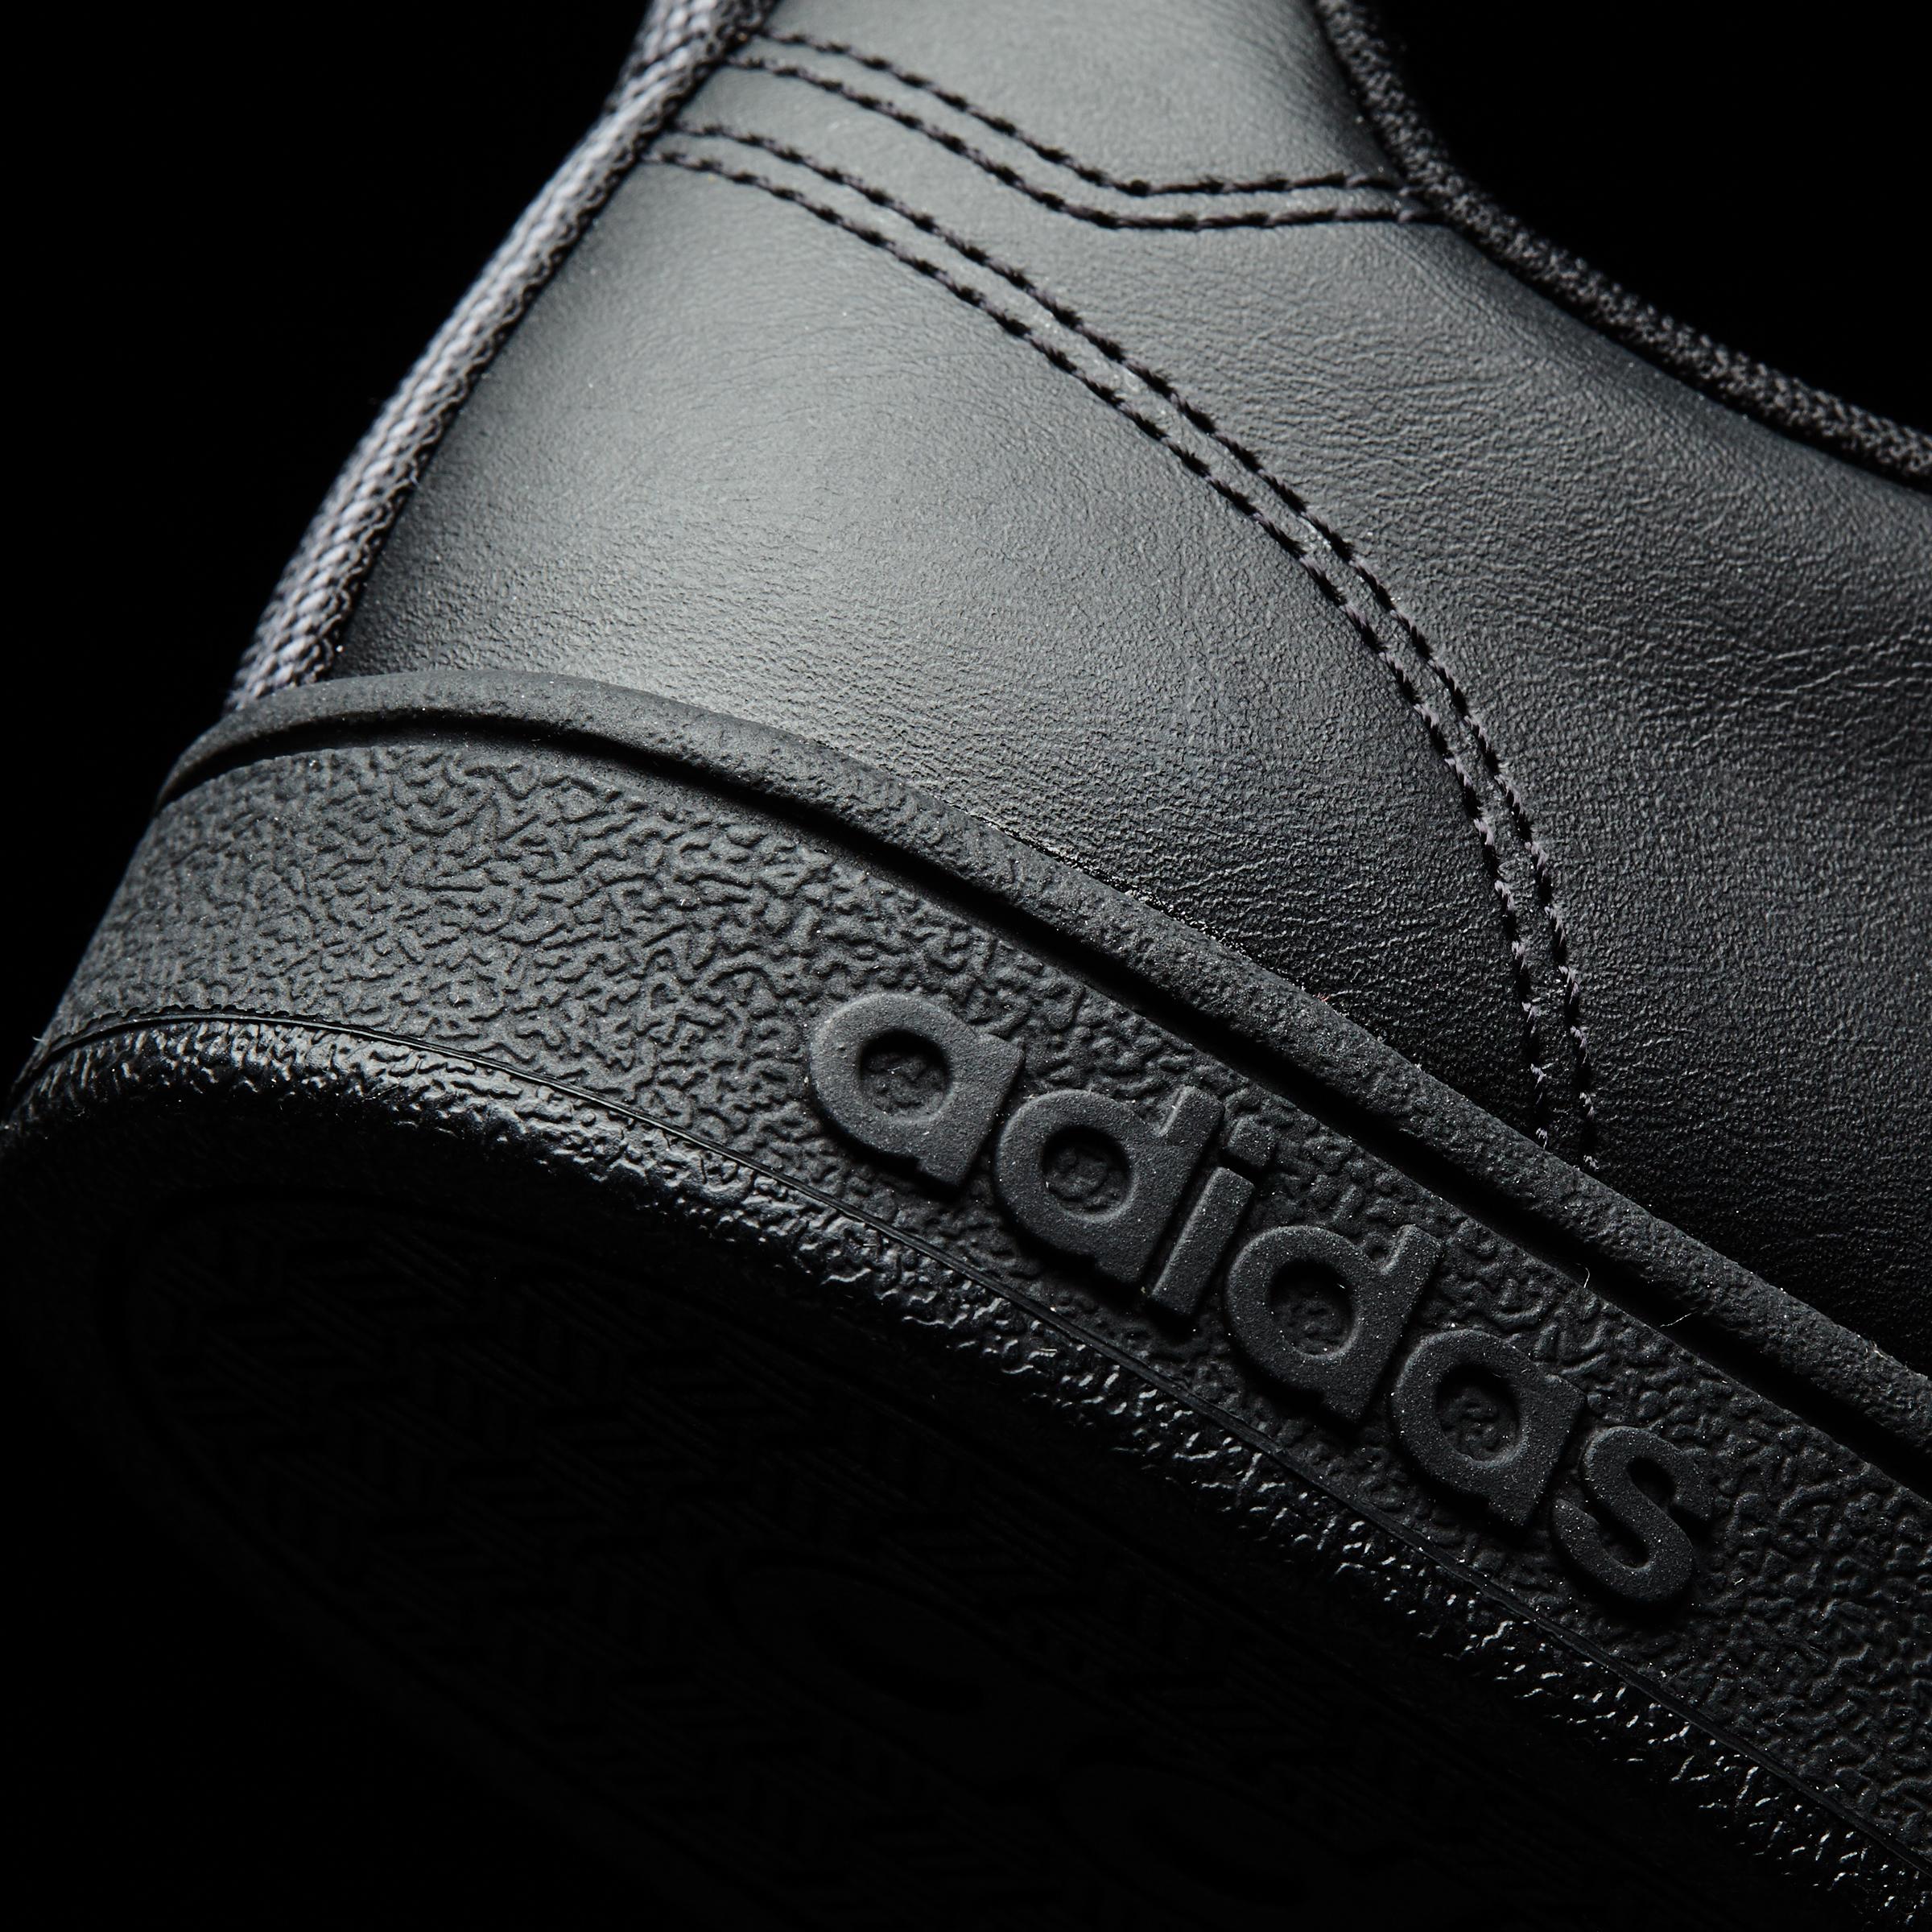 JeunesMec De Advantage À Clean Adidas Vs Chaussures Petits 3A4Rqc5jLS